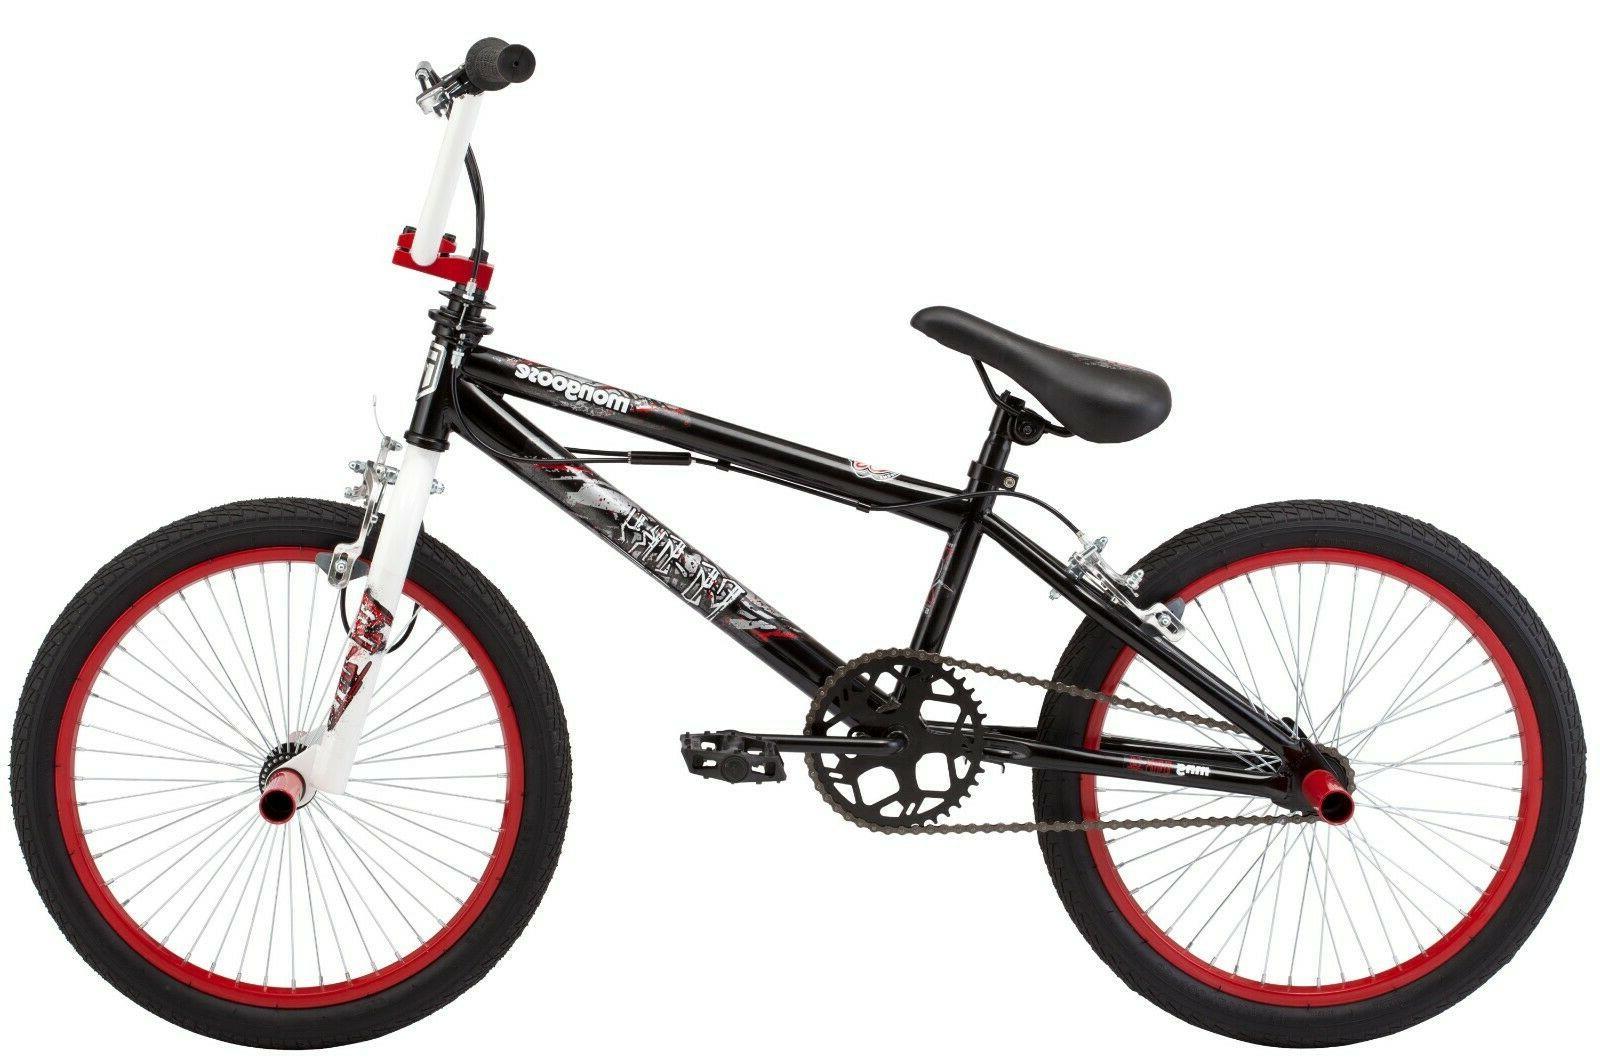 Mongoose BMX Free style Bike Bicycle Black White